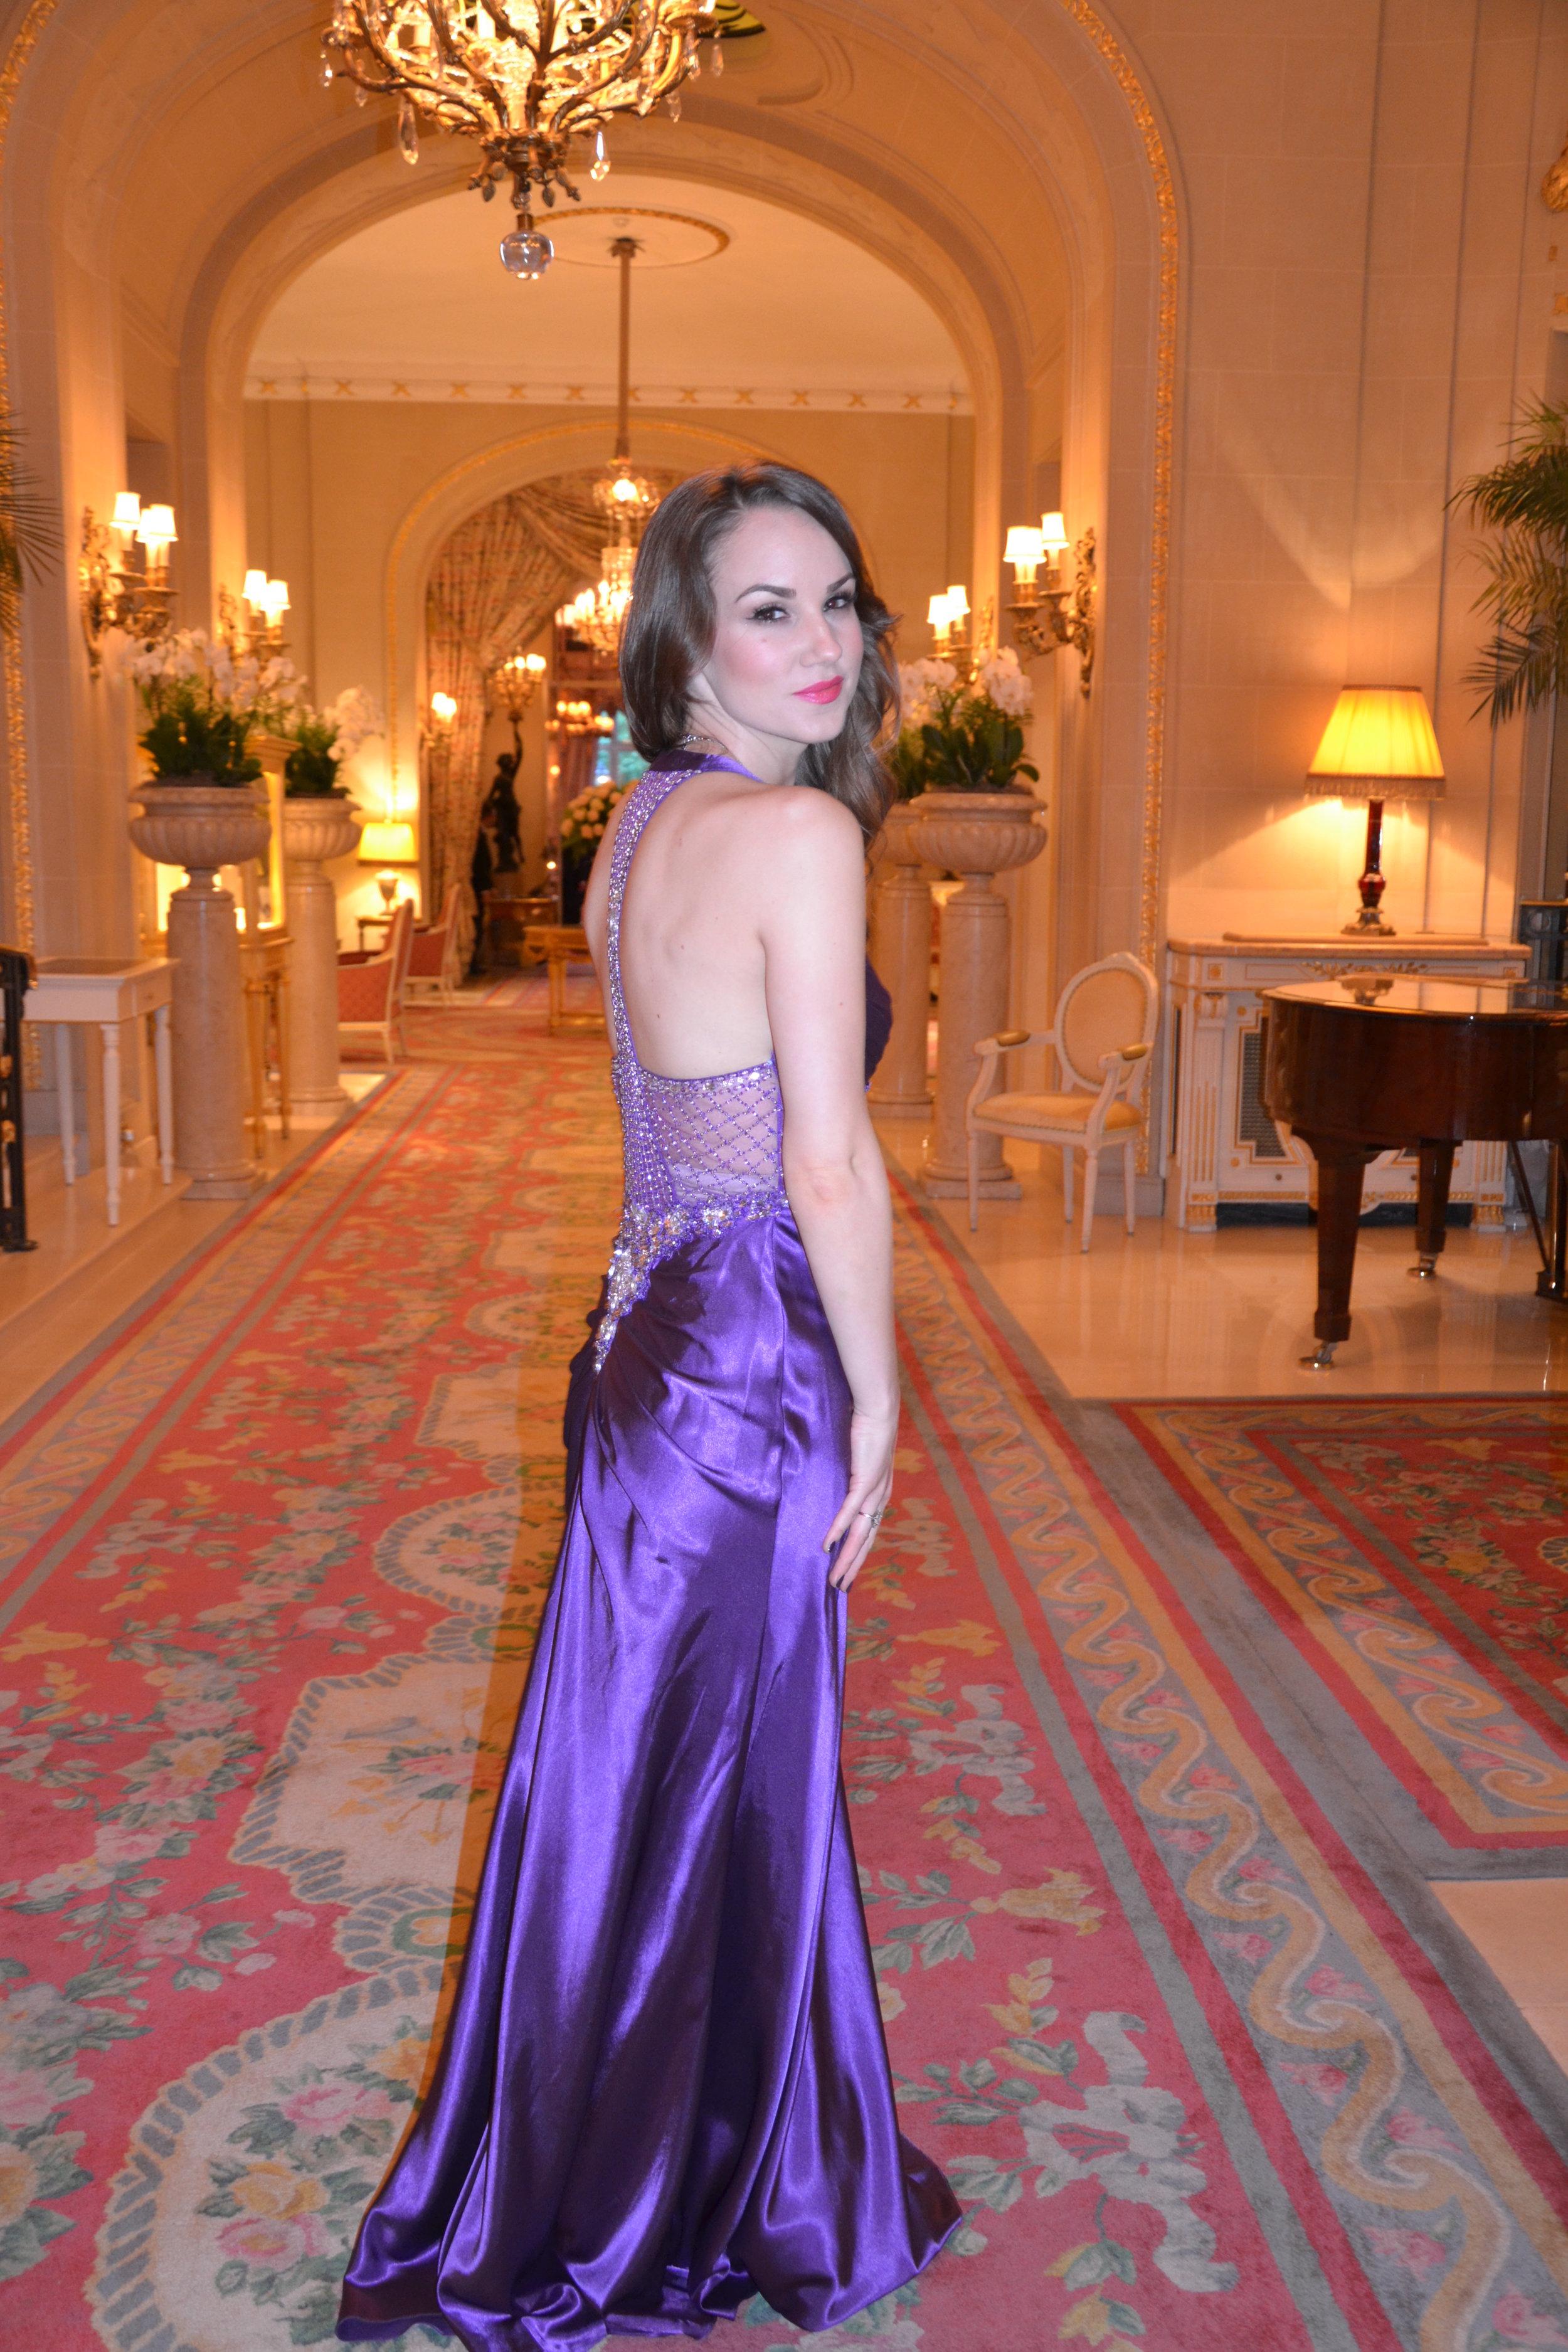 Performing at The Ritz London.